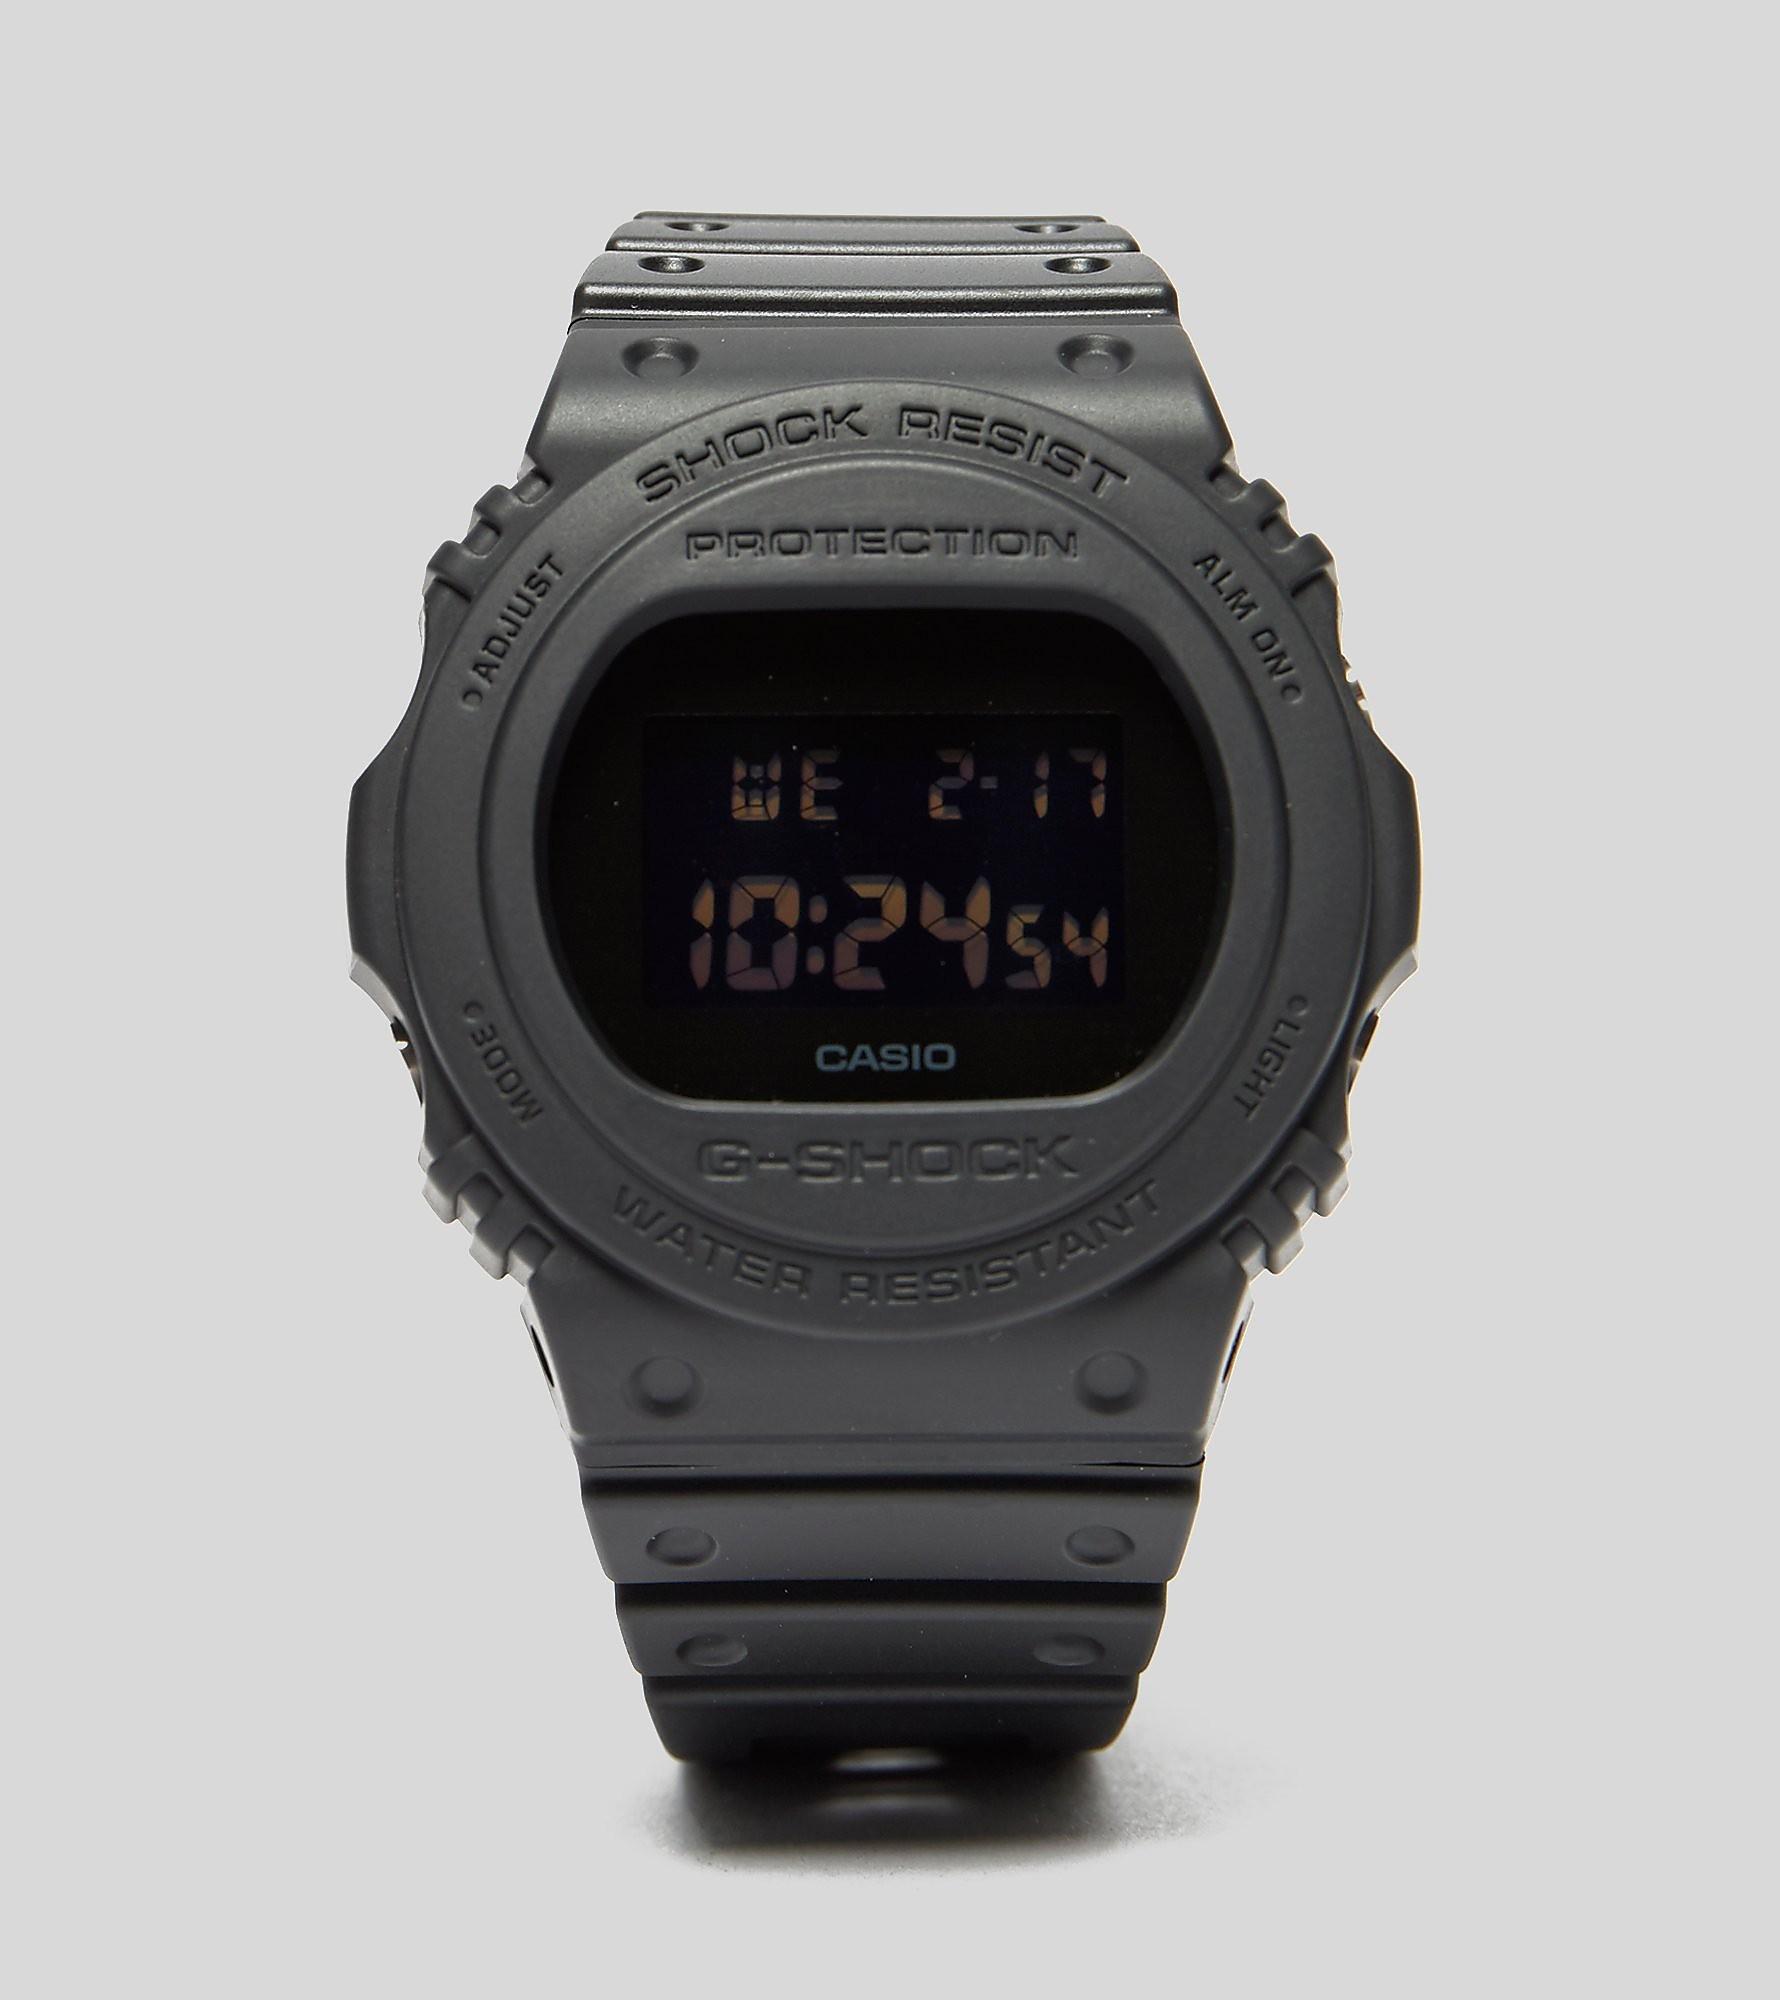 G-Shock DW-5750E-1BER Heritage Watch